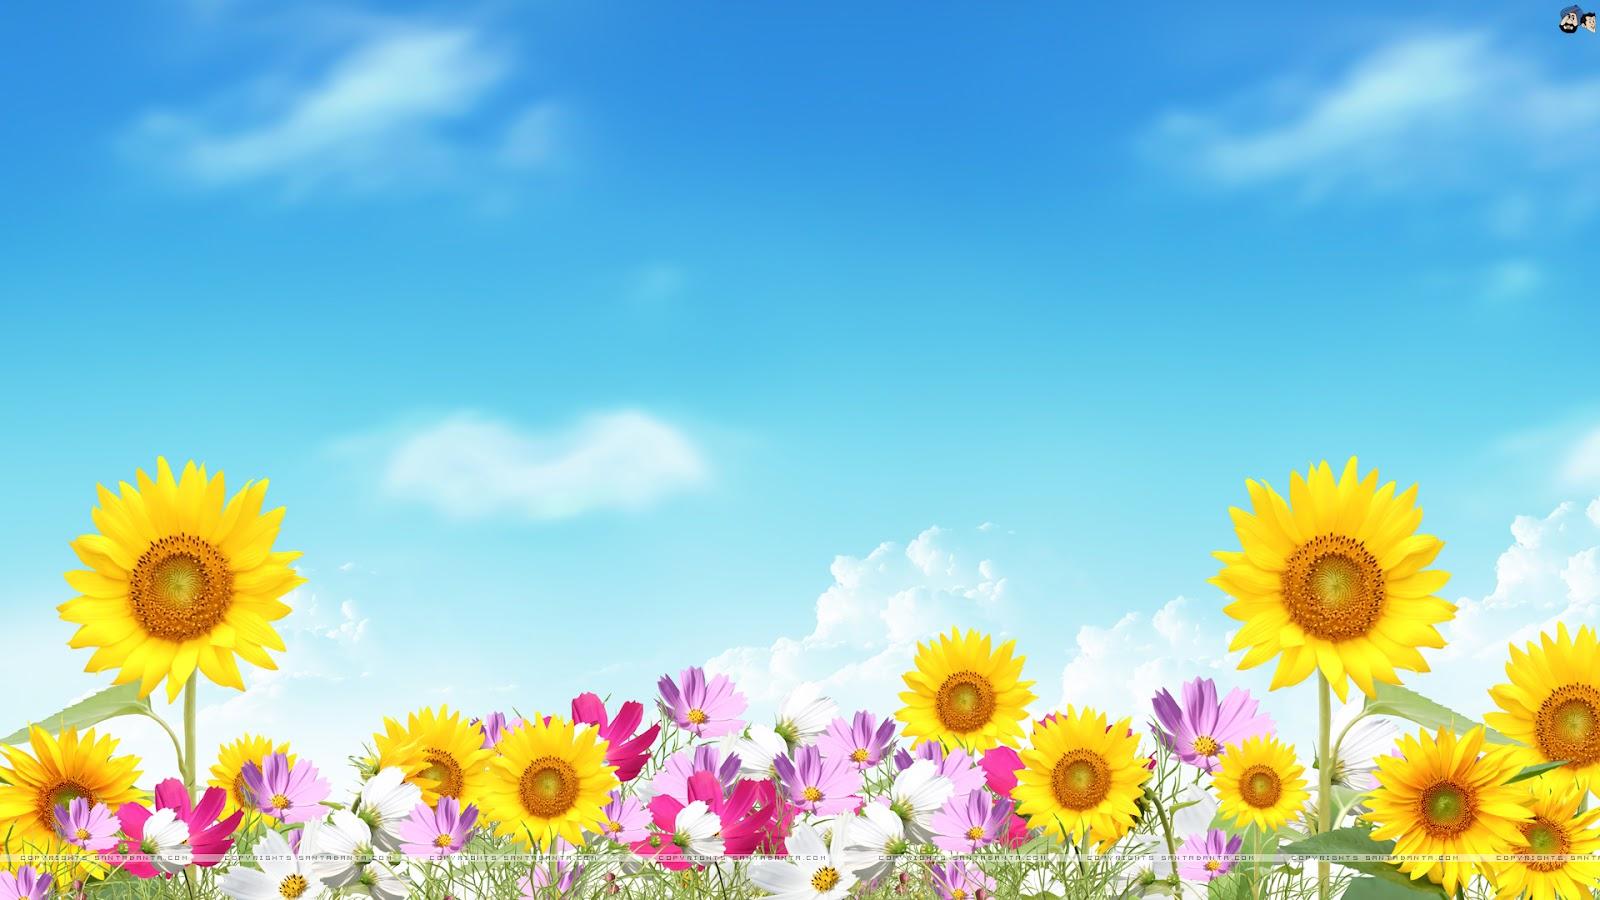 Summer Wallpapers for Desktop 1600x900